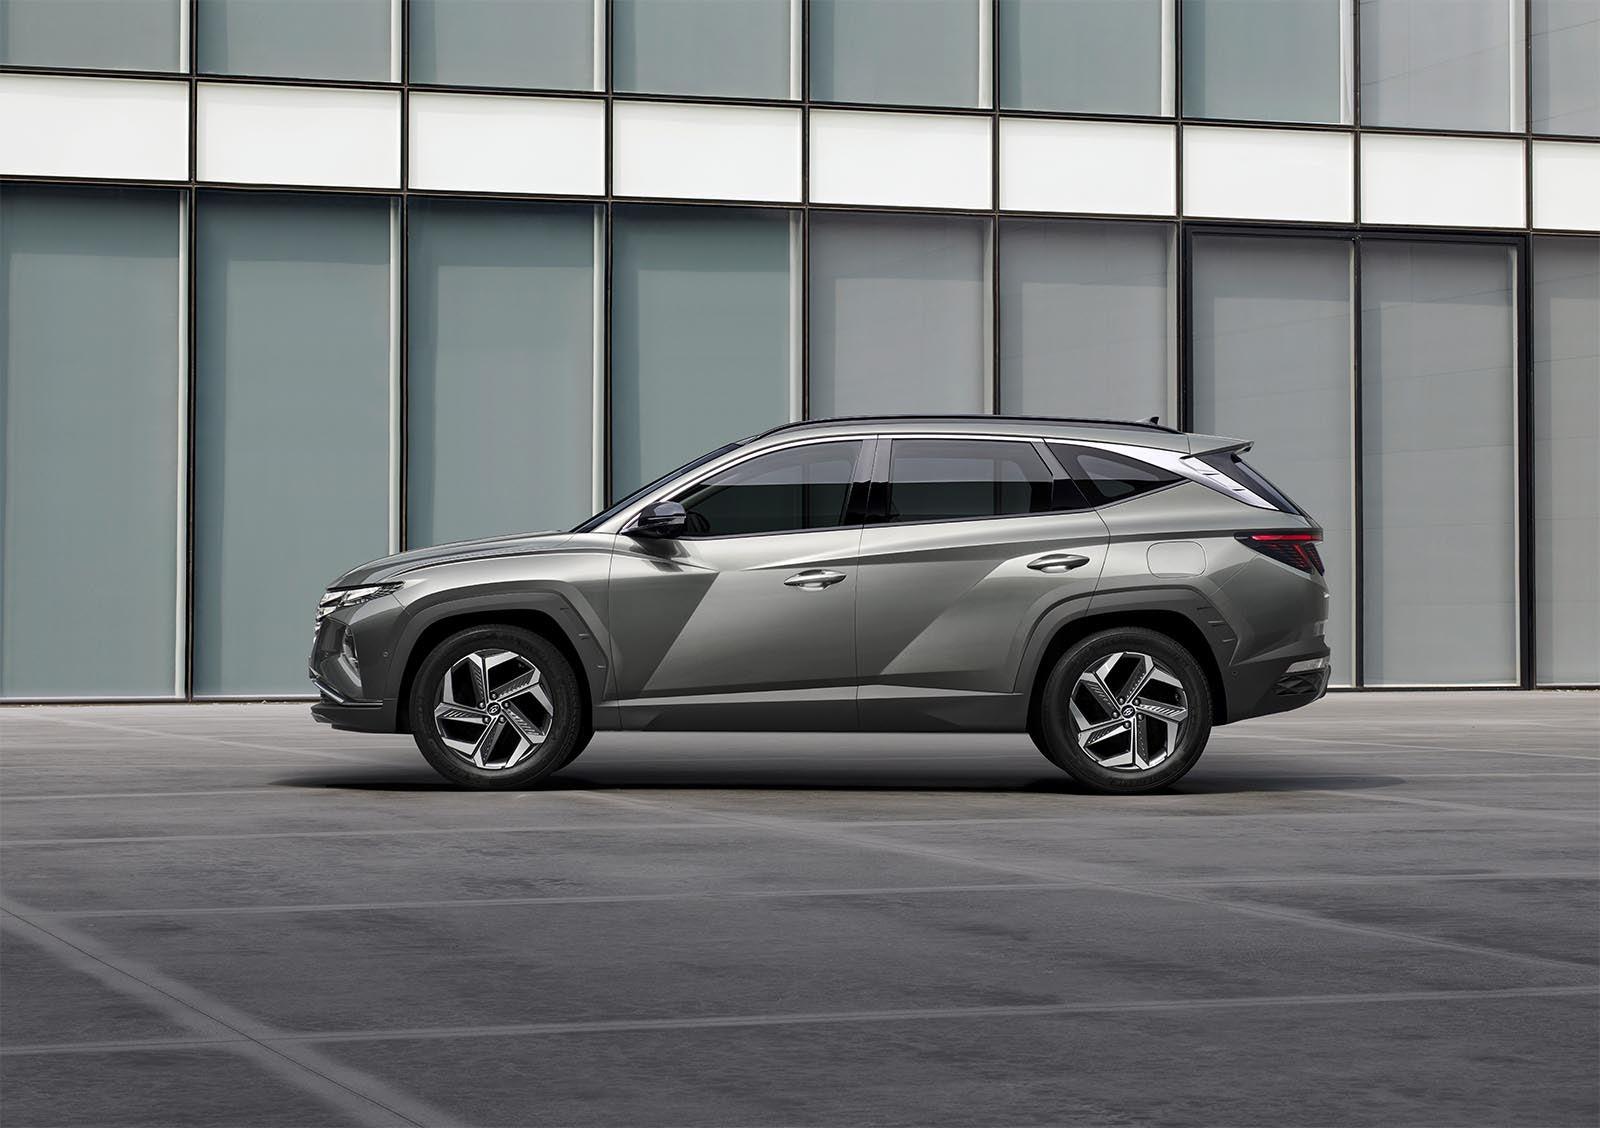 Hyundai Finally Pulls the Wraps Off 2022 Tucson - The ...